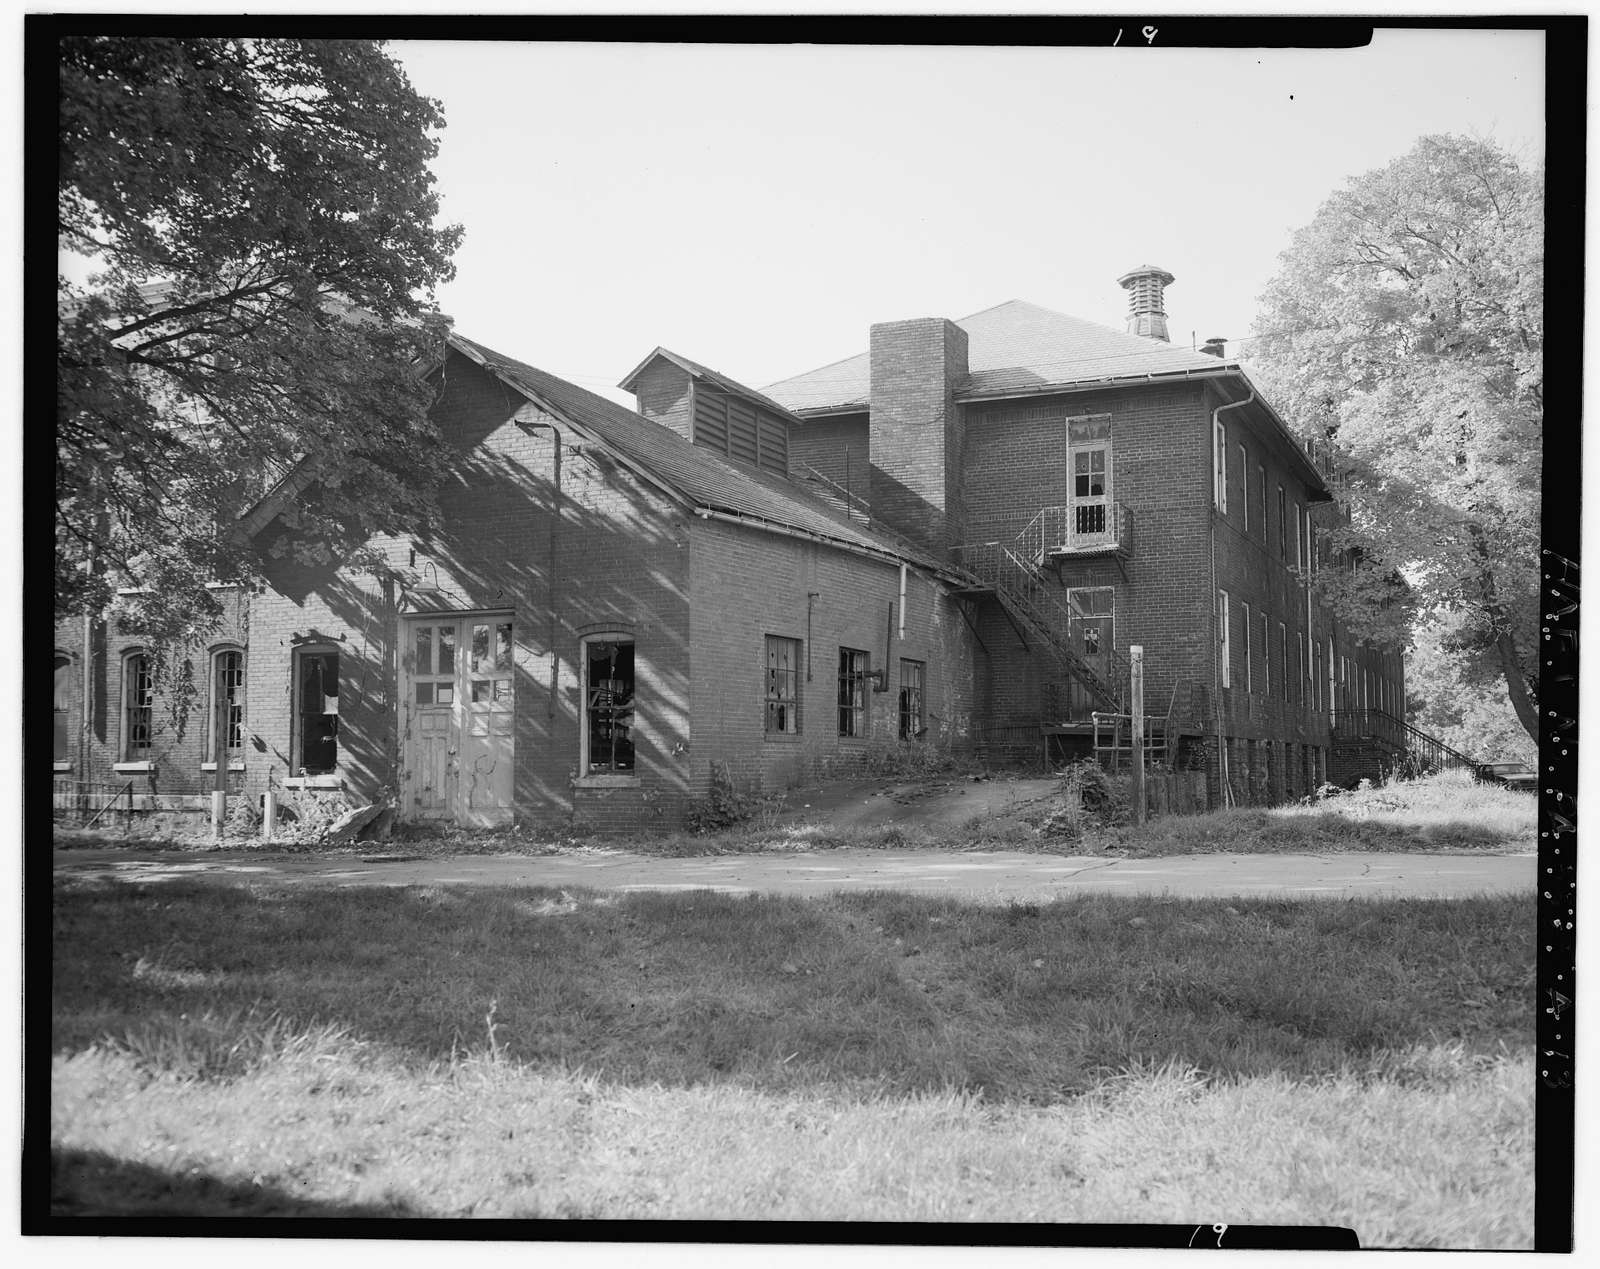 Washington County Old Men's Home, Main Building, 2198 North Main Street, Arden, Washington County, PA